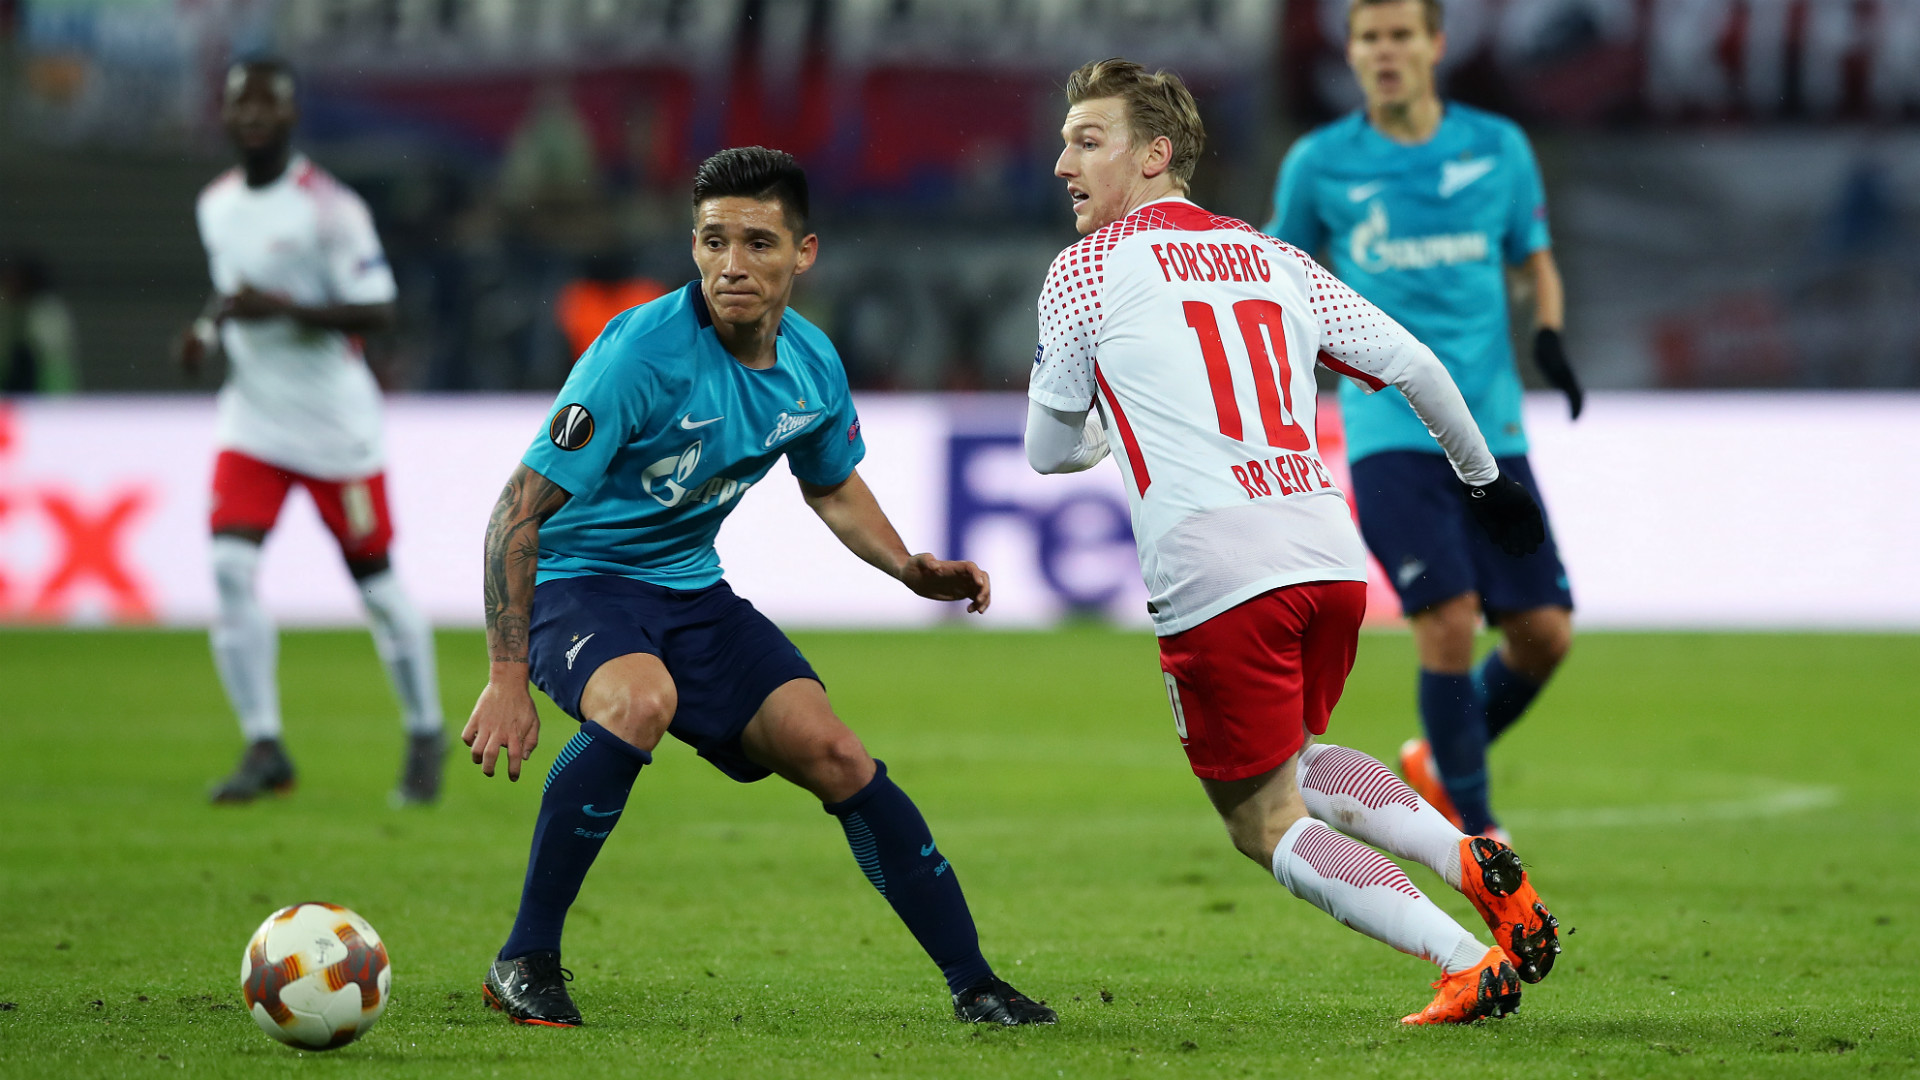 Matias Kranevitter Emil Forsberg Zenit RB Leipzig Europa League 08032018